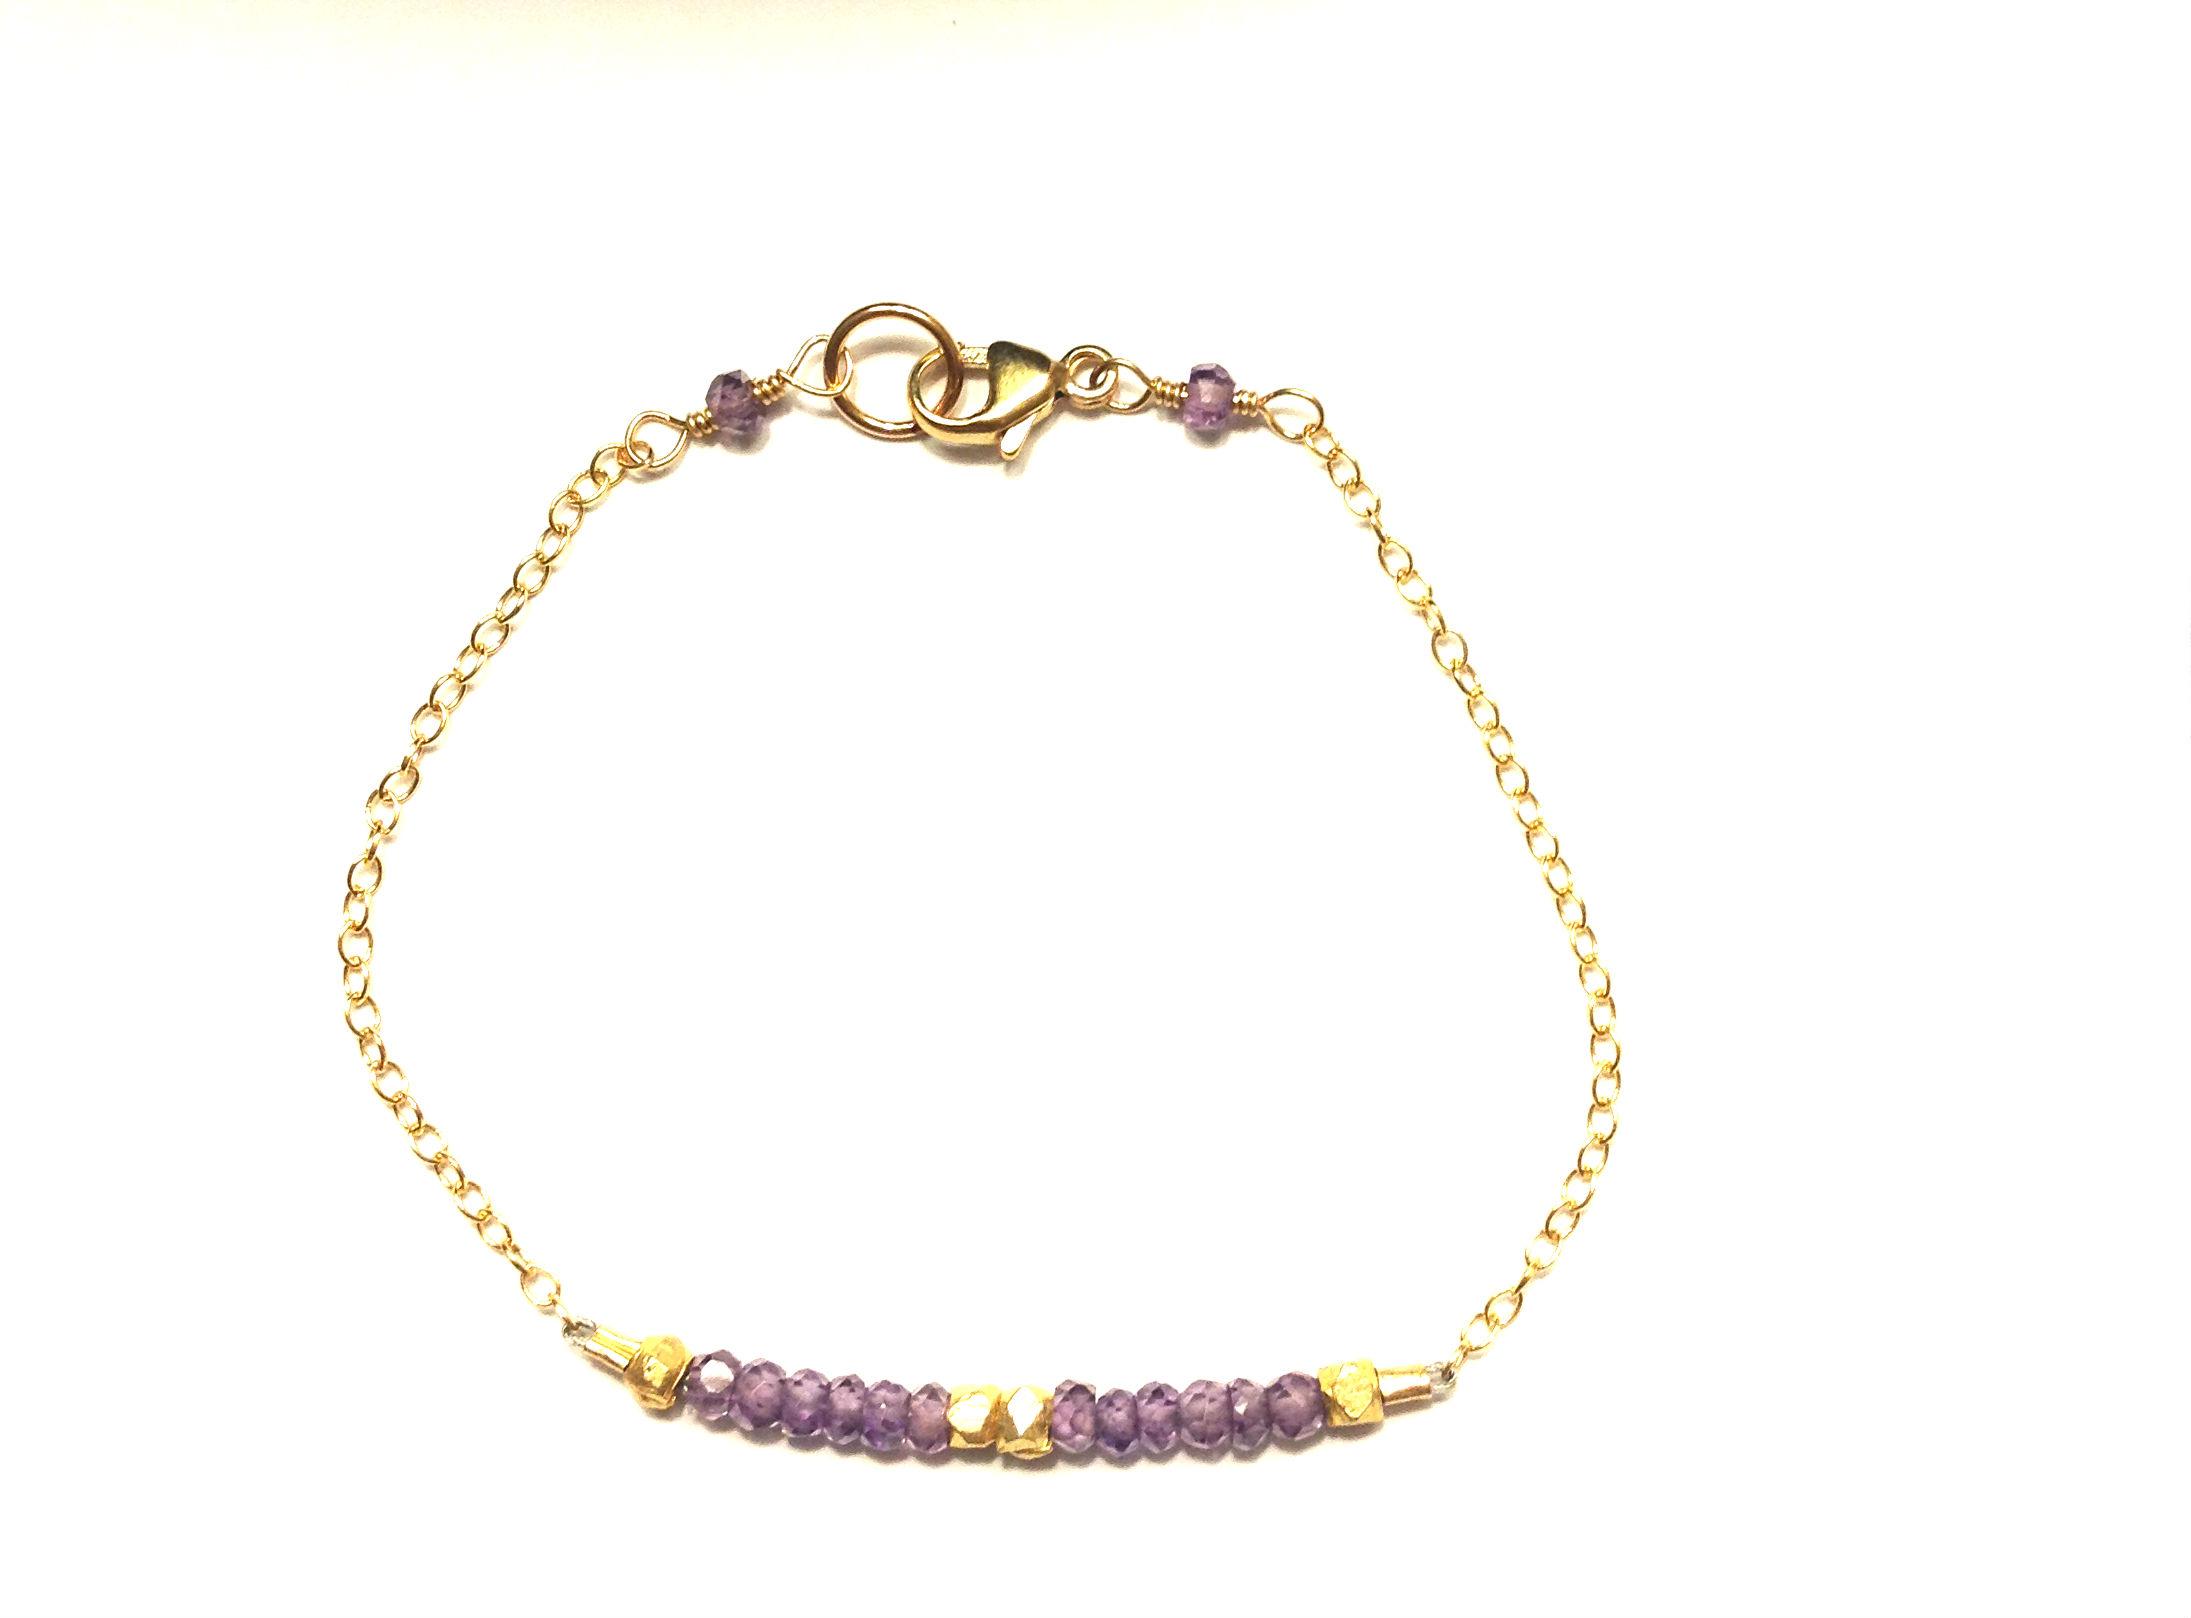 Sobella Jewelry Gold Handmade Bracelet Giveaway